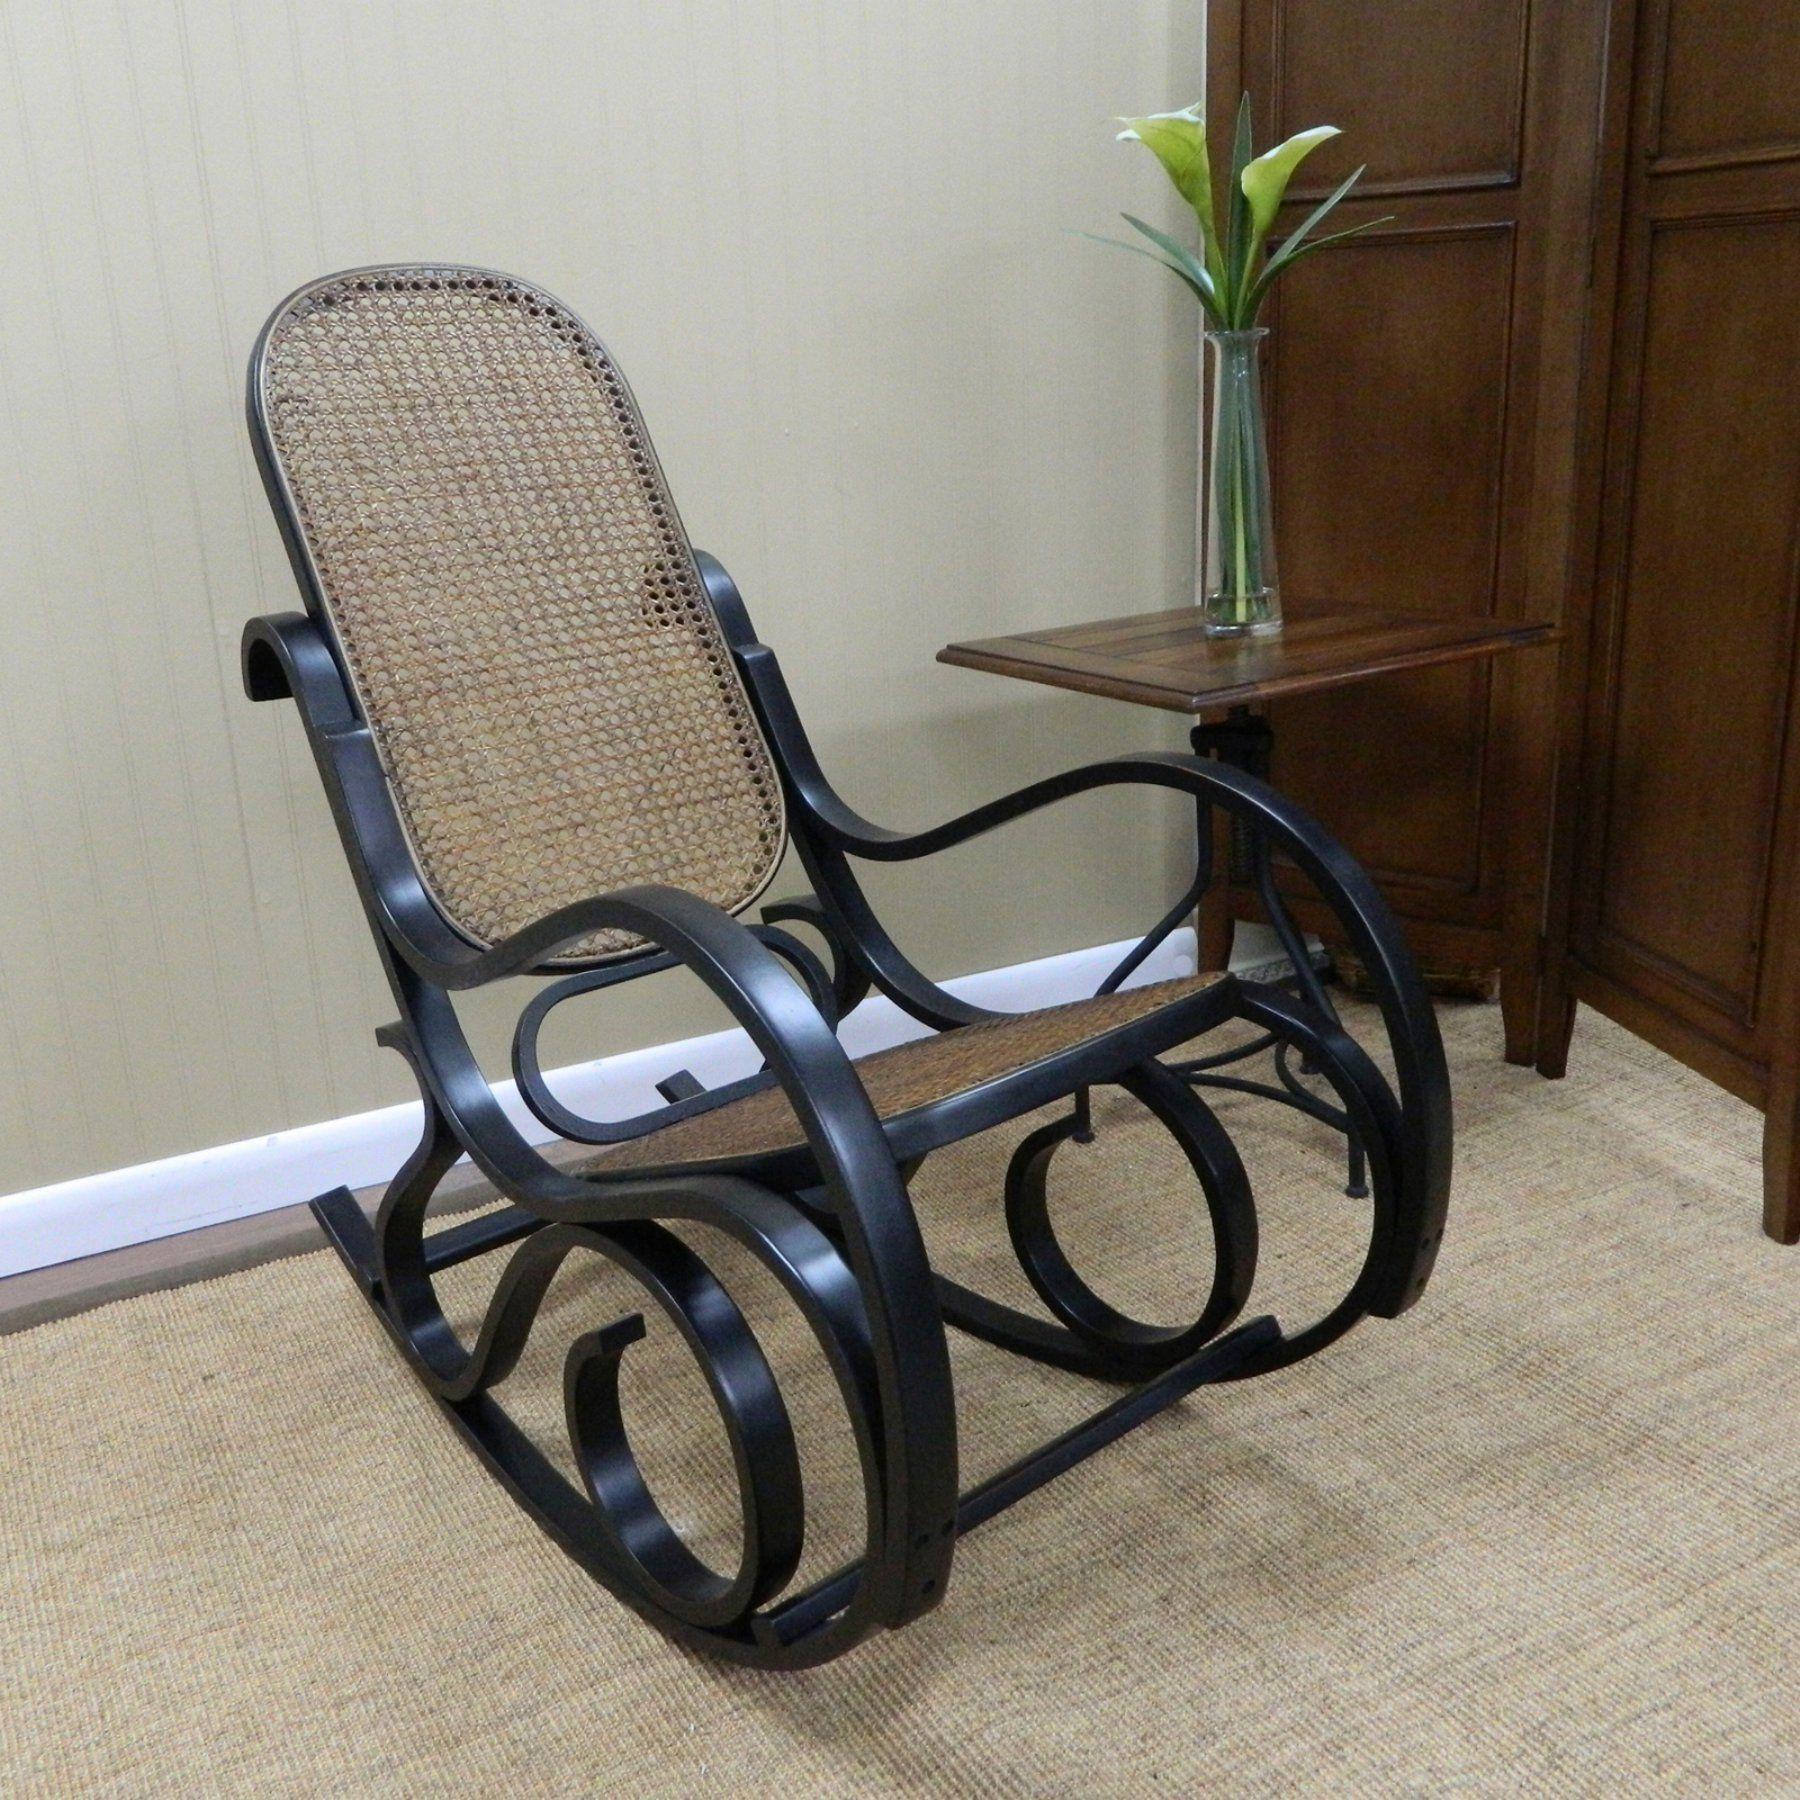 Delightful Carolina Cottage Victoria Bentwood Rocking Chair   51190 NC